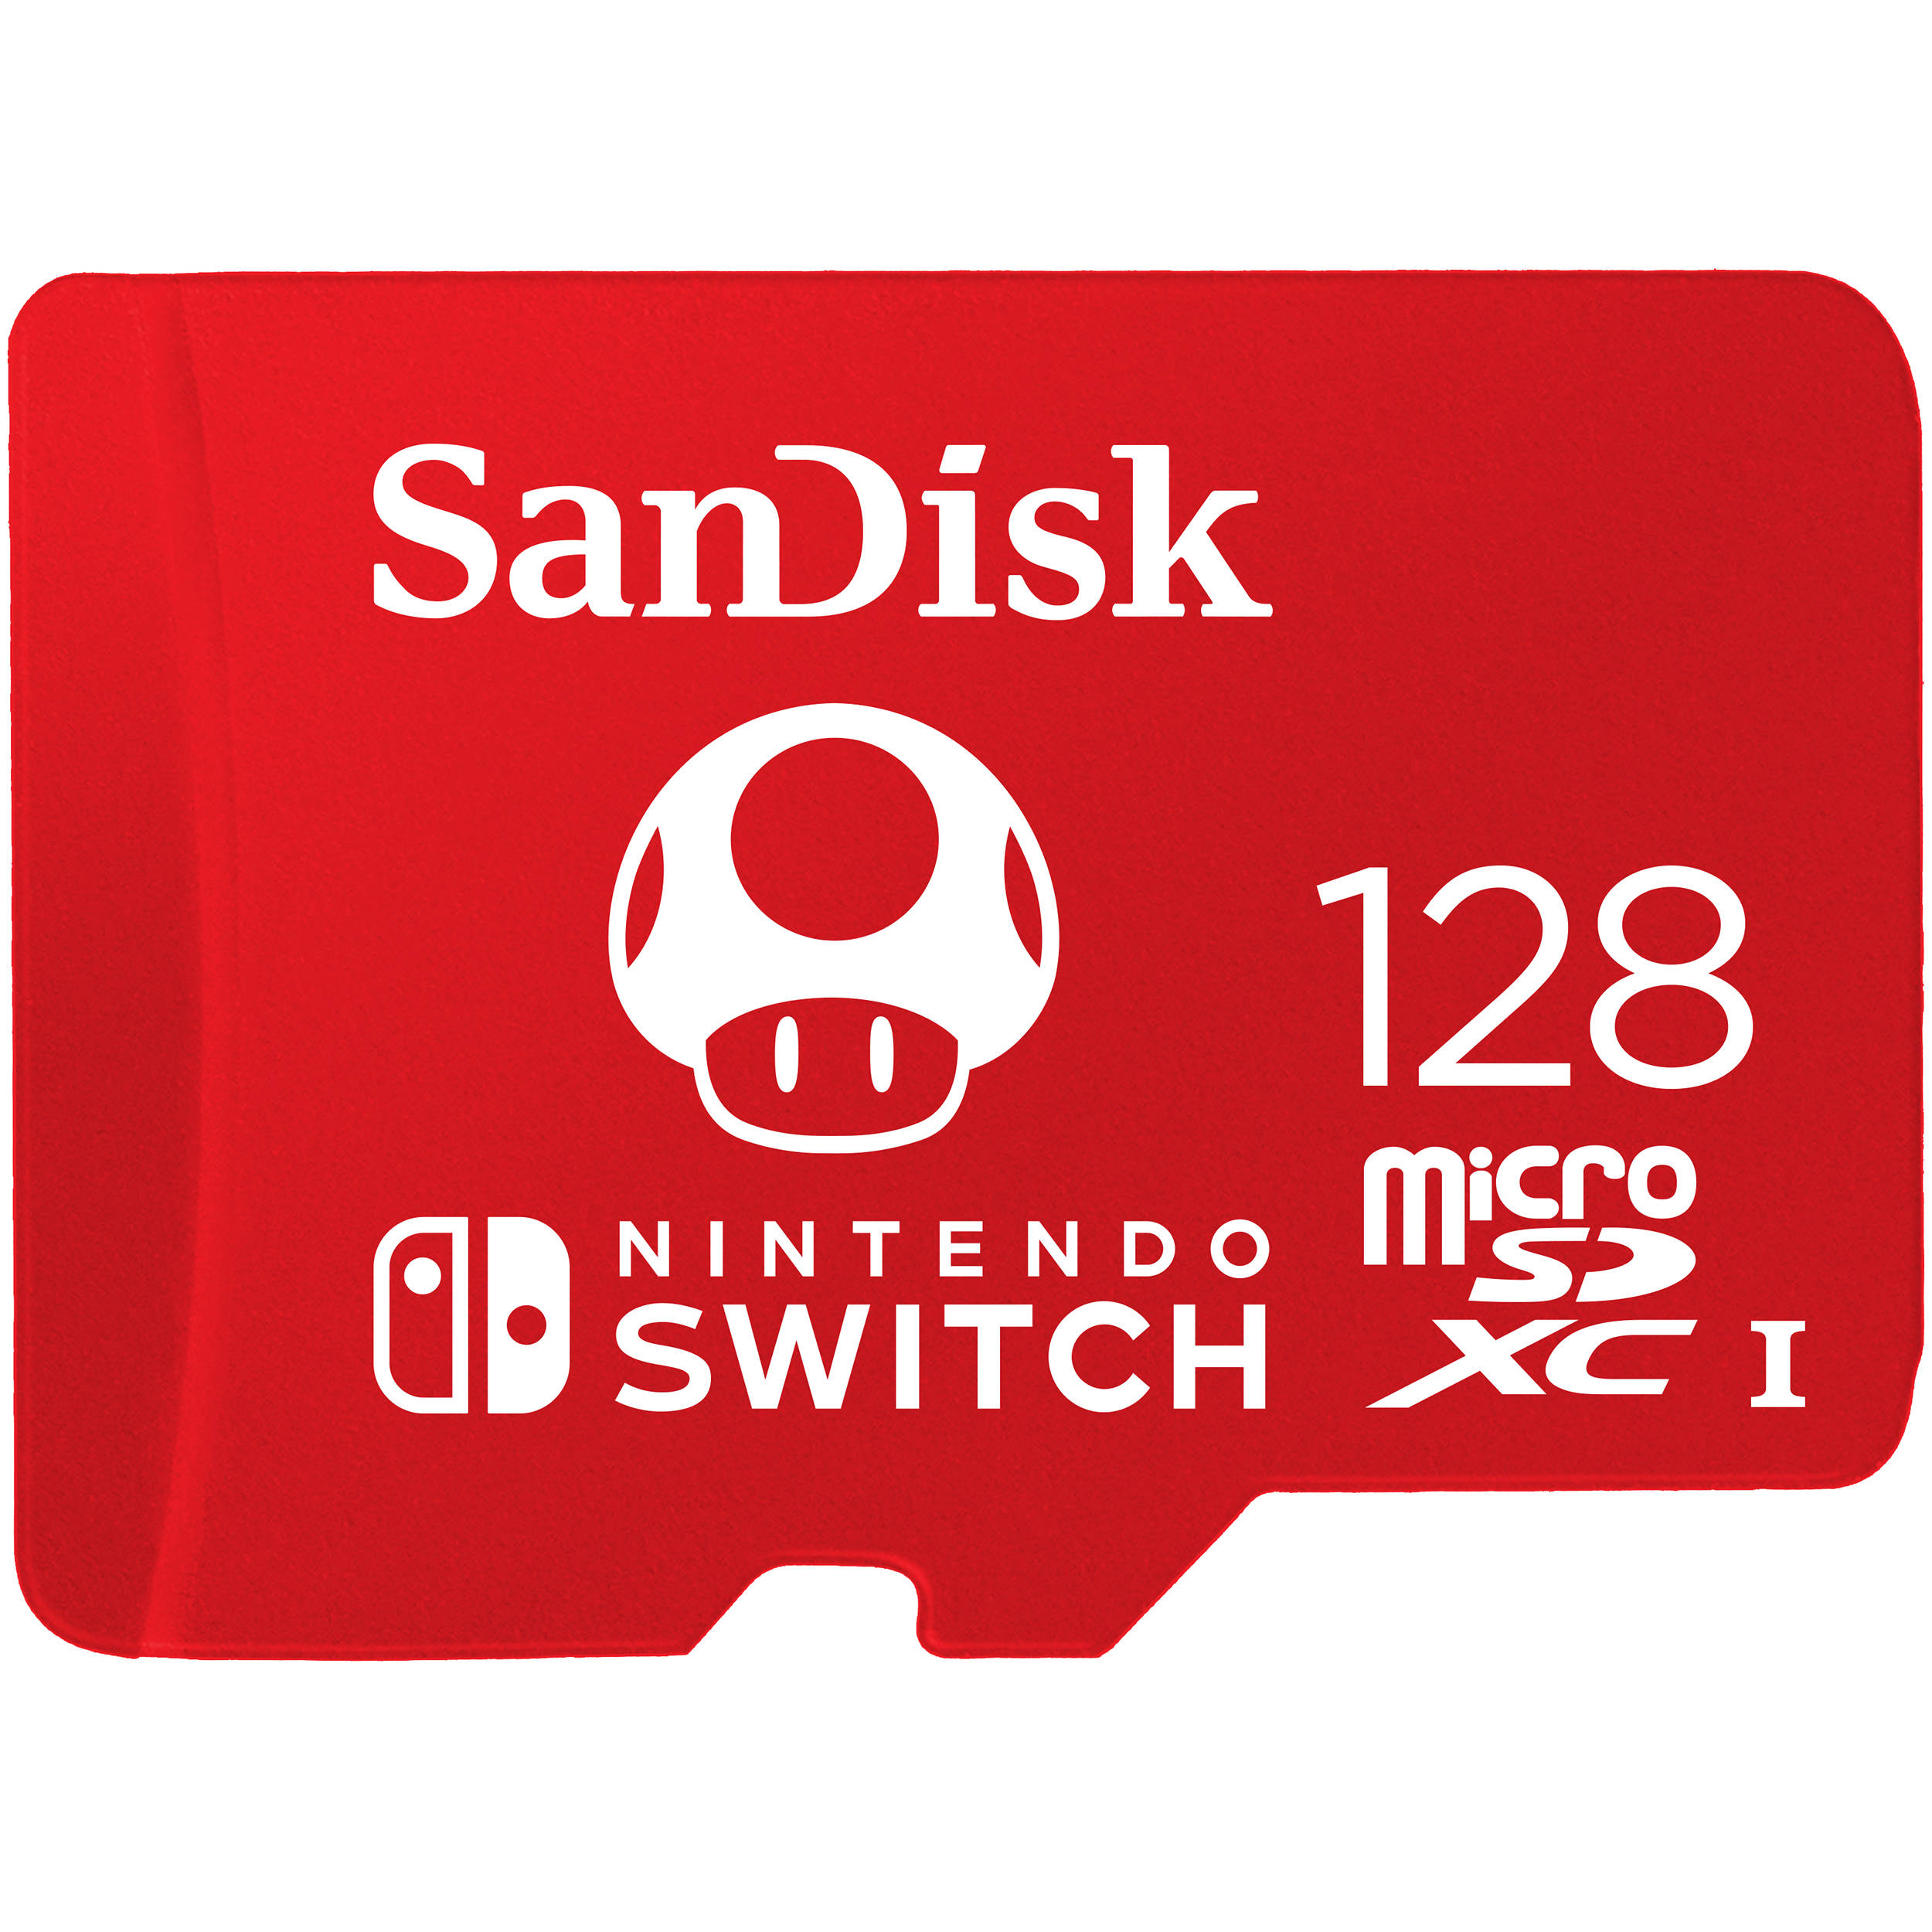 Sandisk 128gb Uhs I Microsdxc Memory Card For The Nintendo Switch